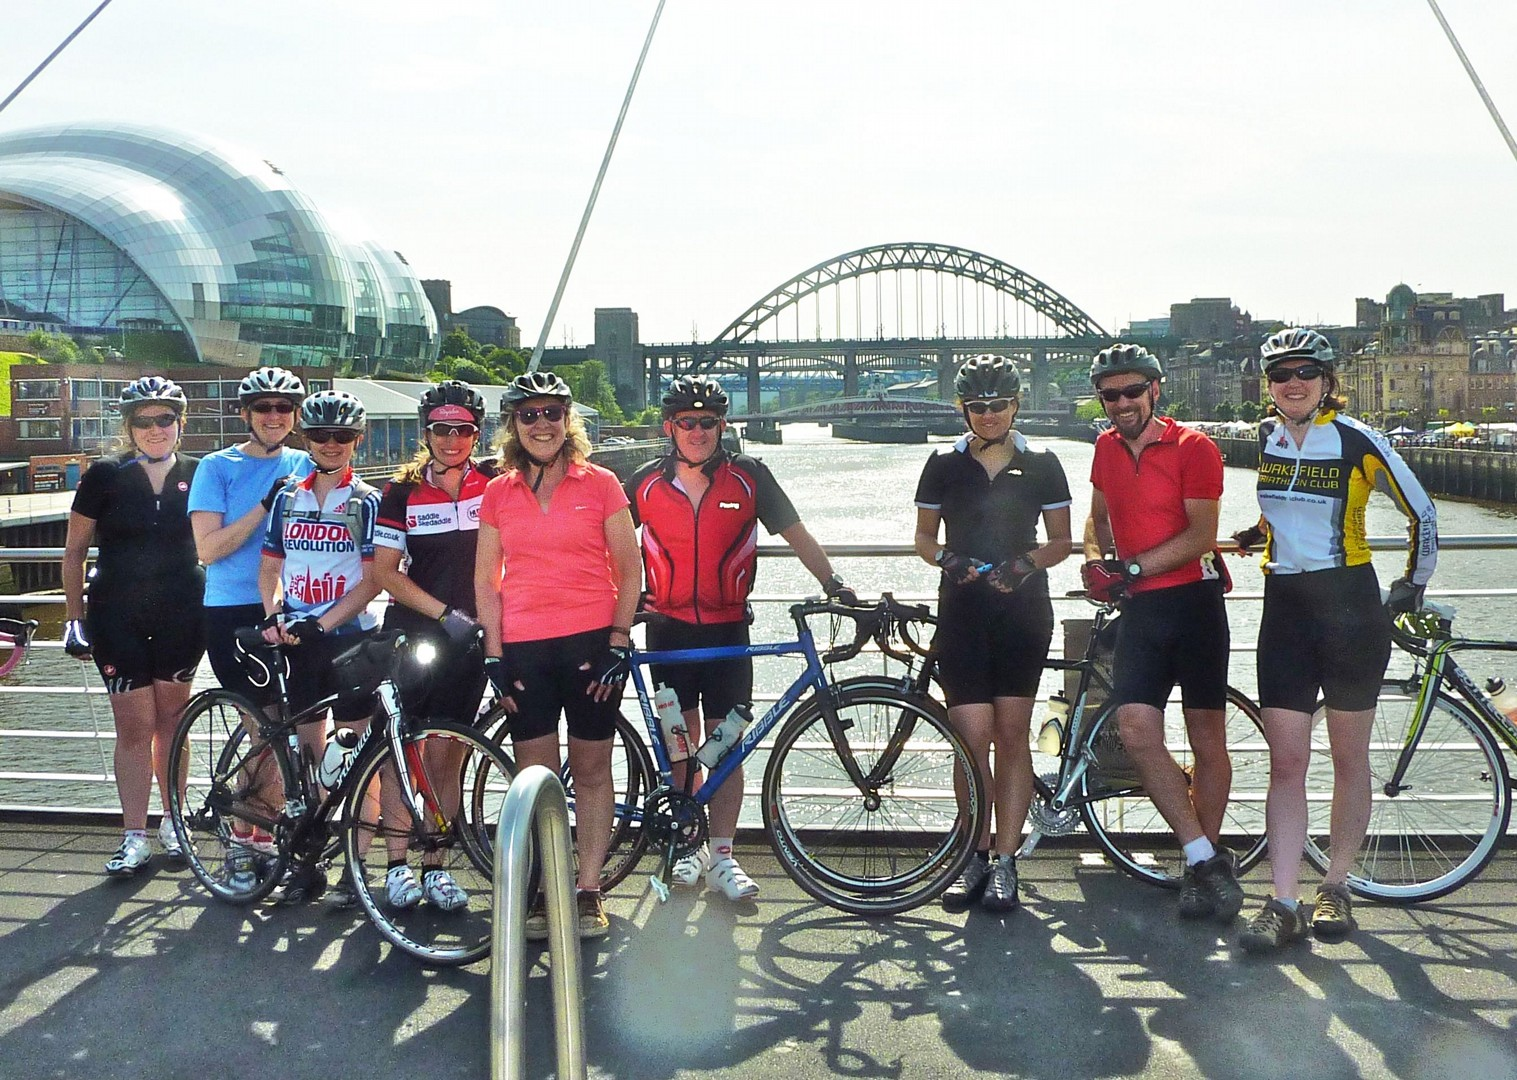 newcastle-millenium-bridge-cycling-weekend.jpg - UK - Northumberland - Road Cycling